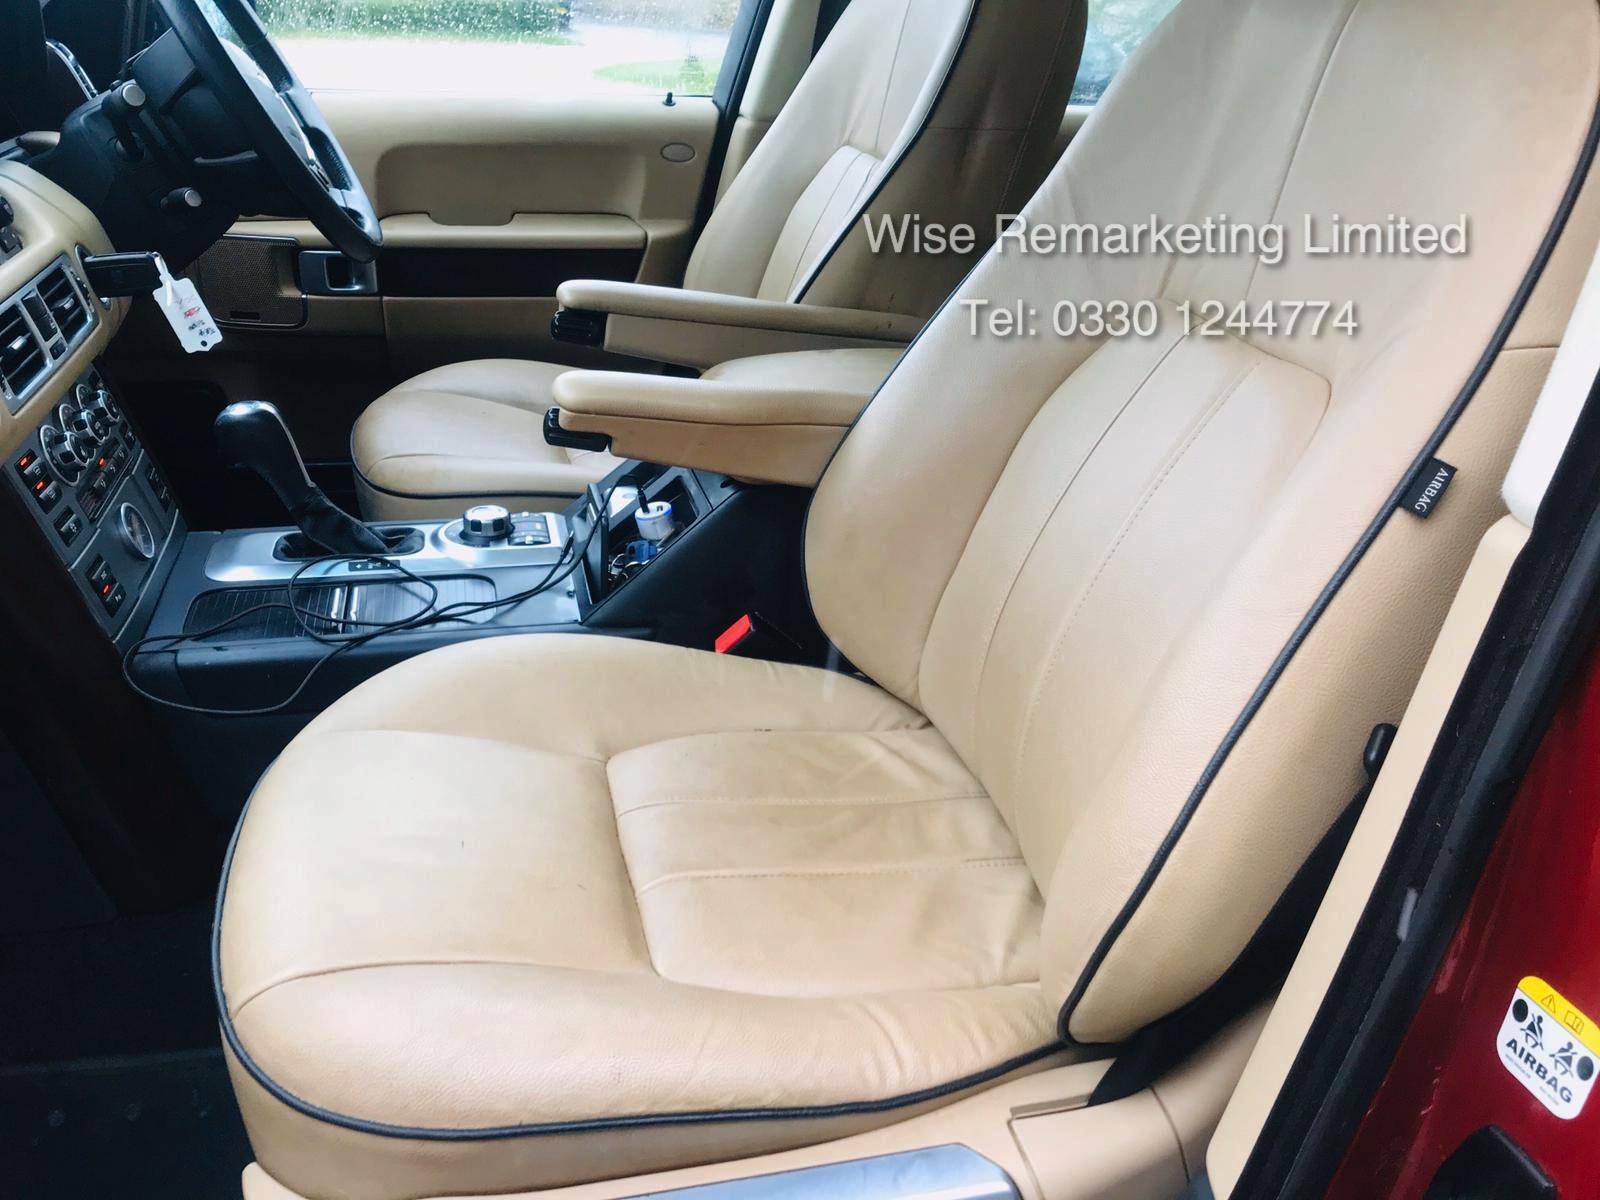 Range Rover Vogue 3.6 TDV8 HSE Auto - 2010 Model - Cream Leather - Service History - - Image 14 of 28